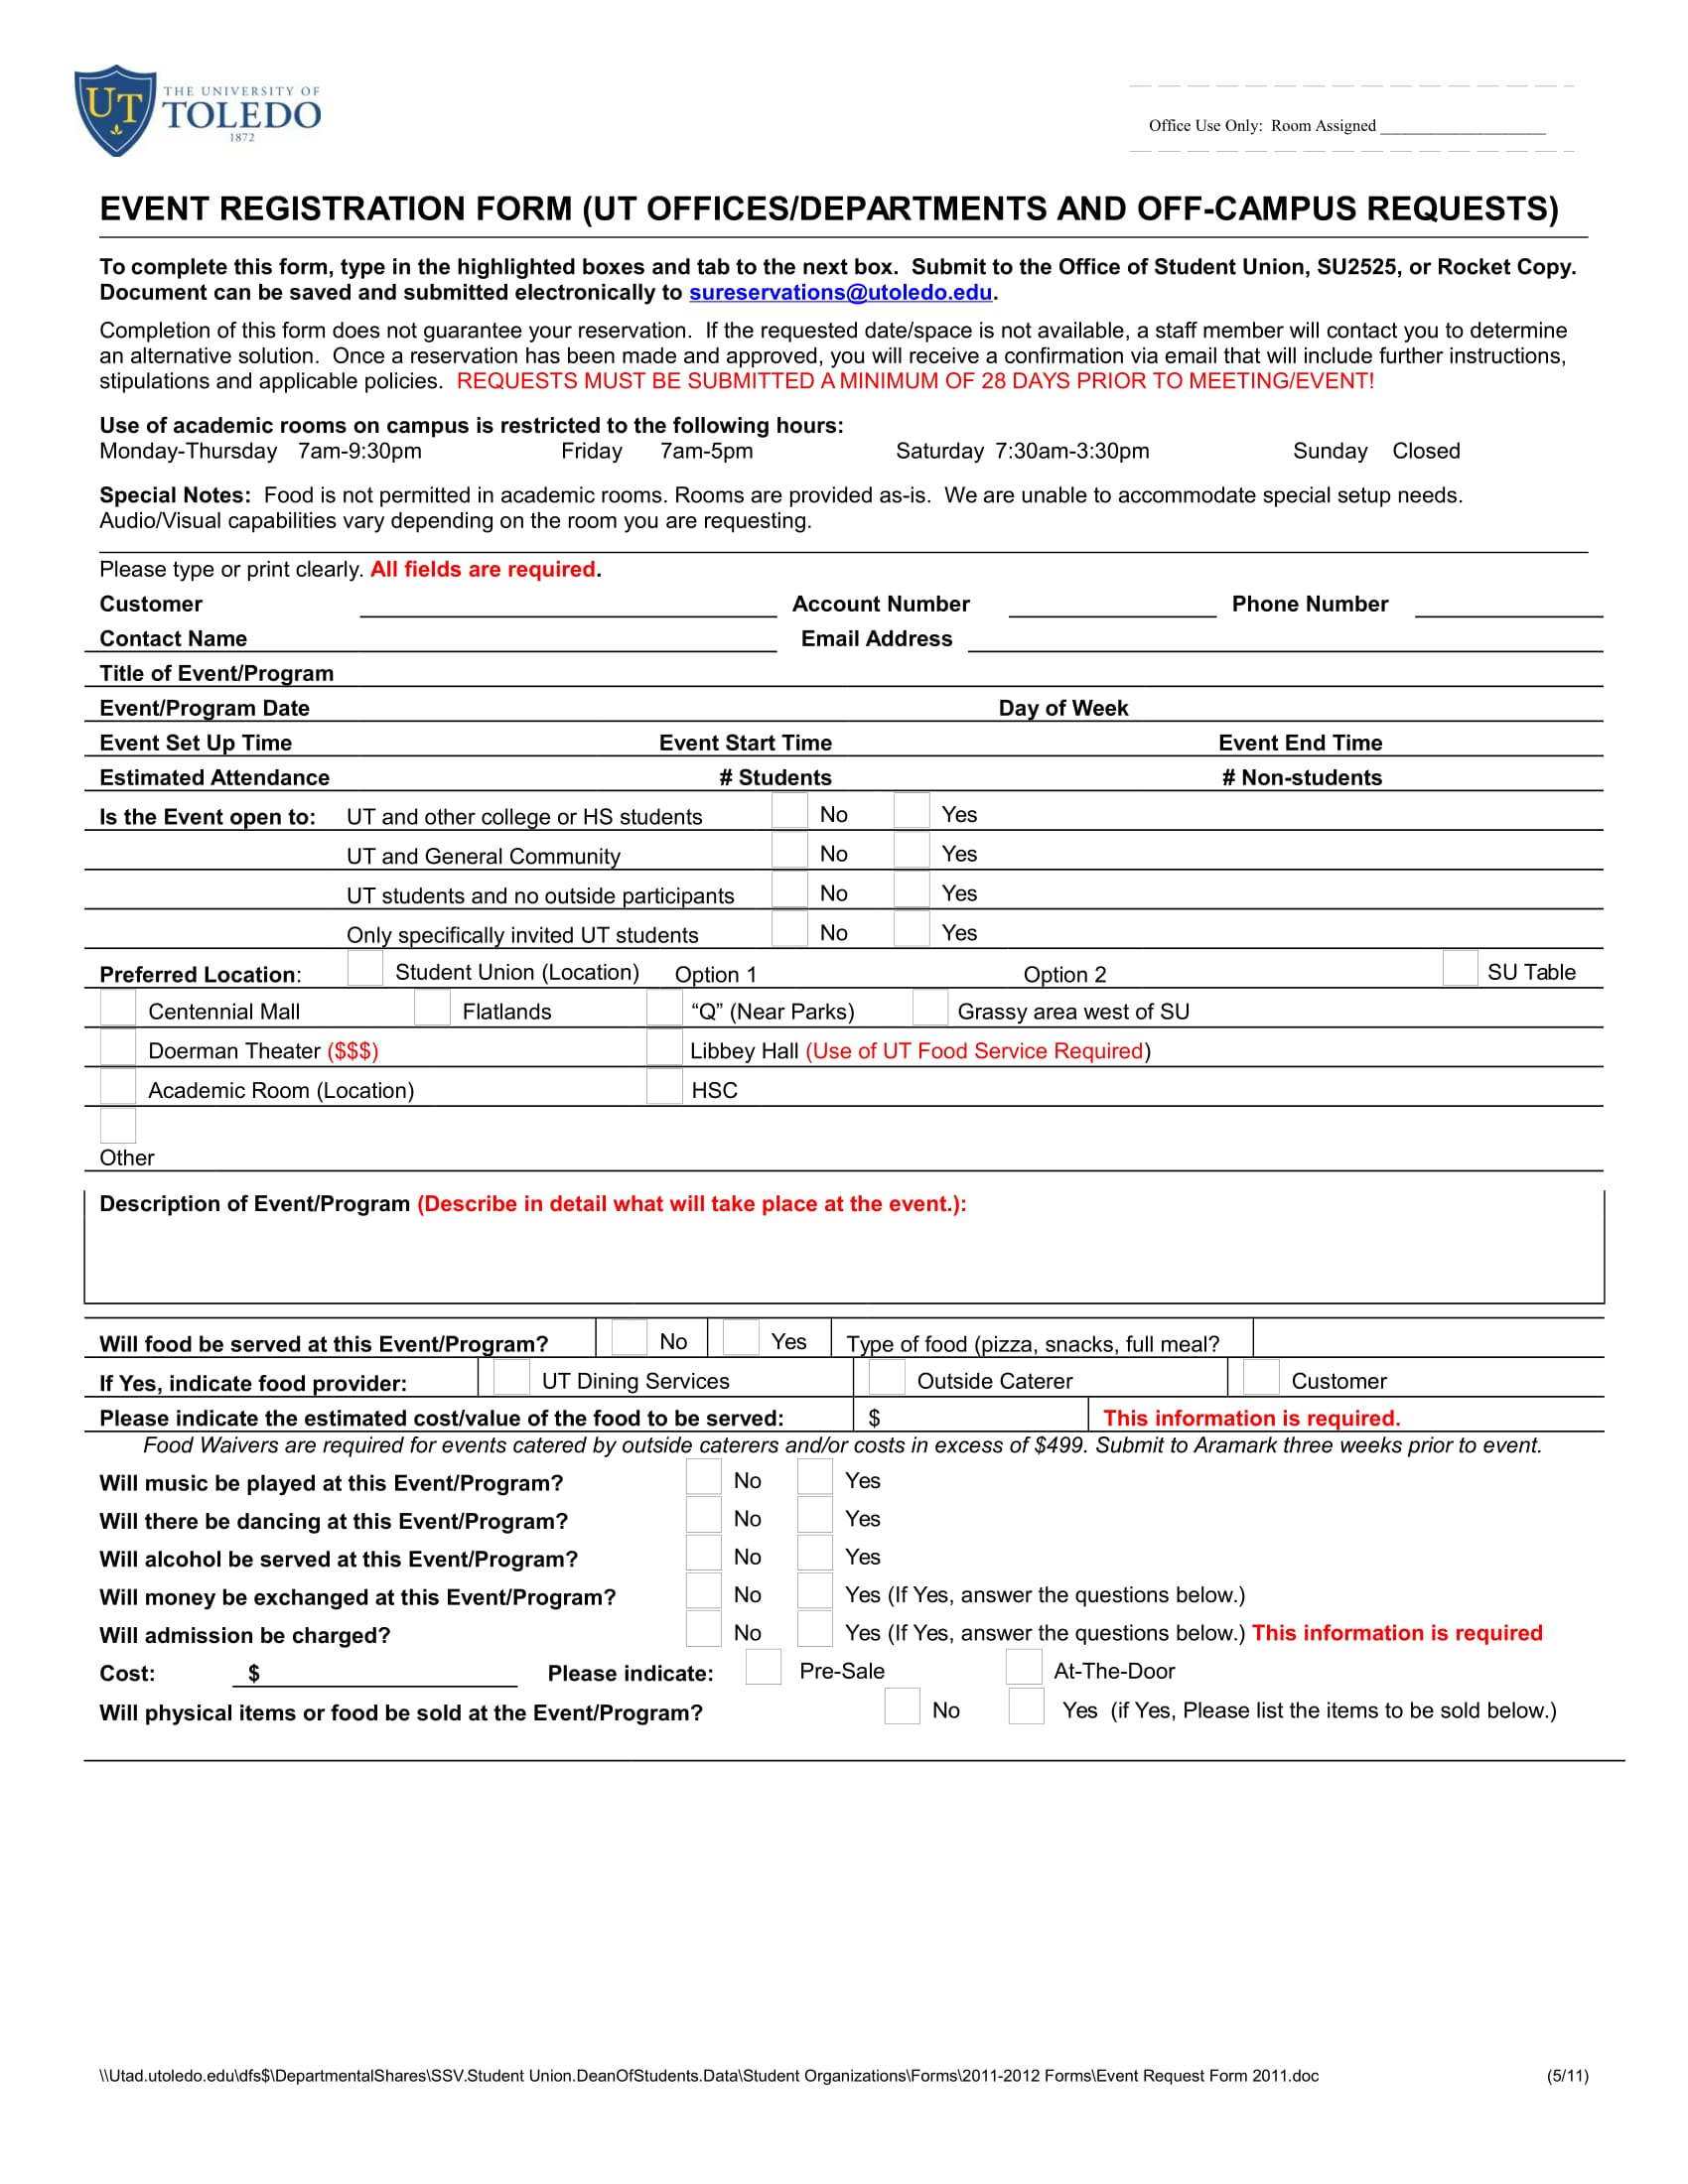 university event registration form 11